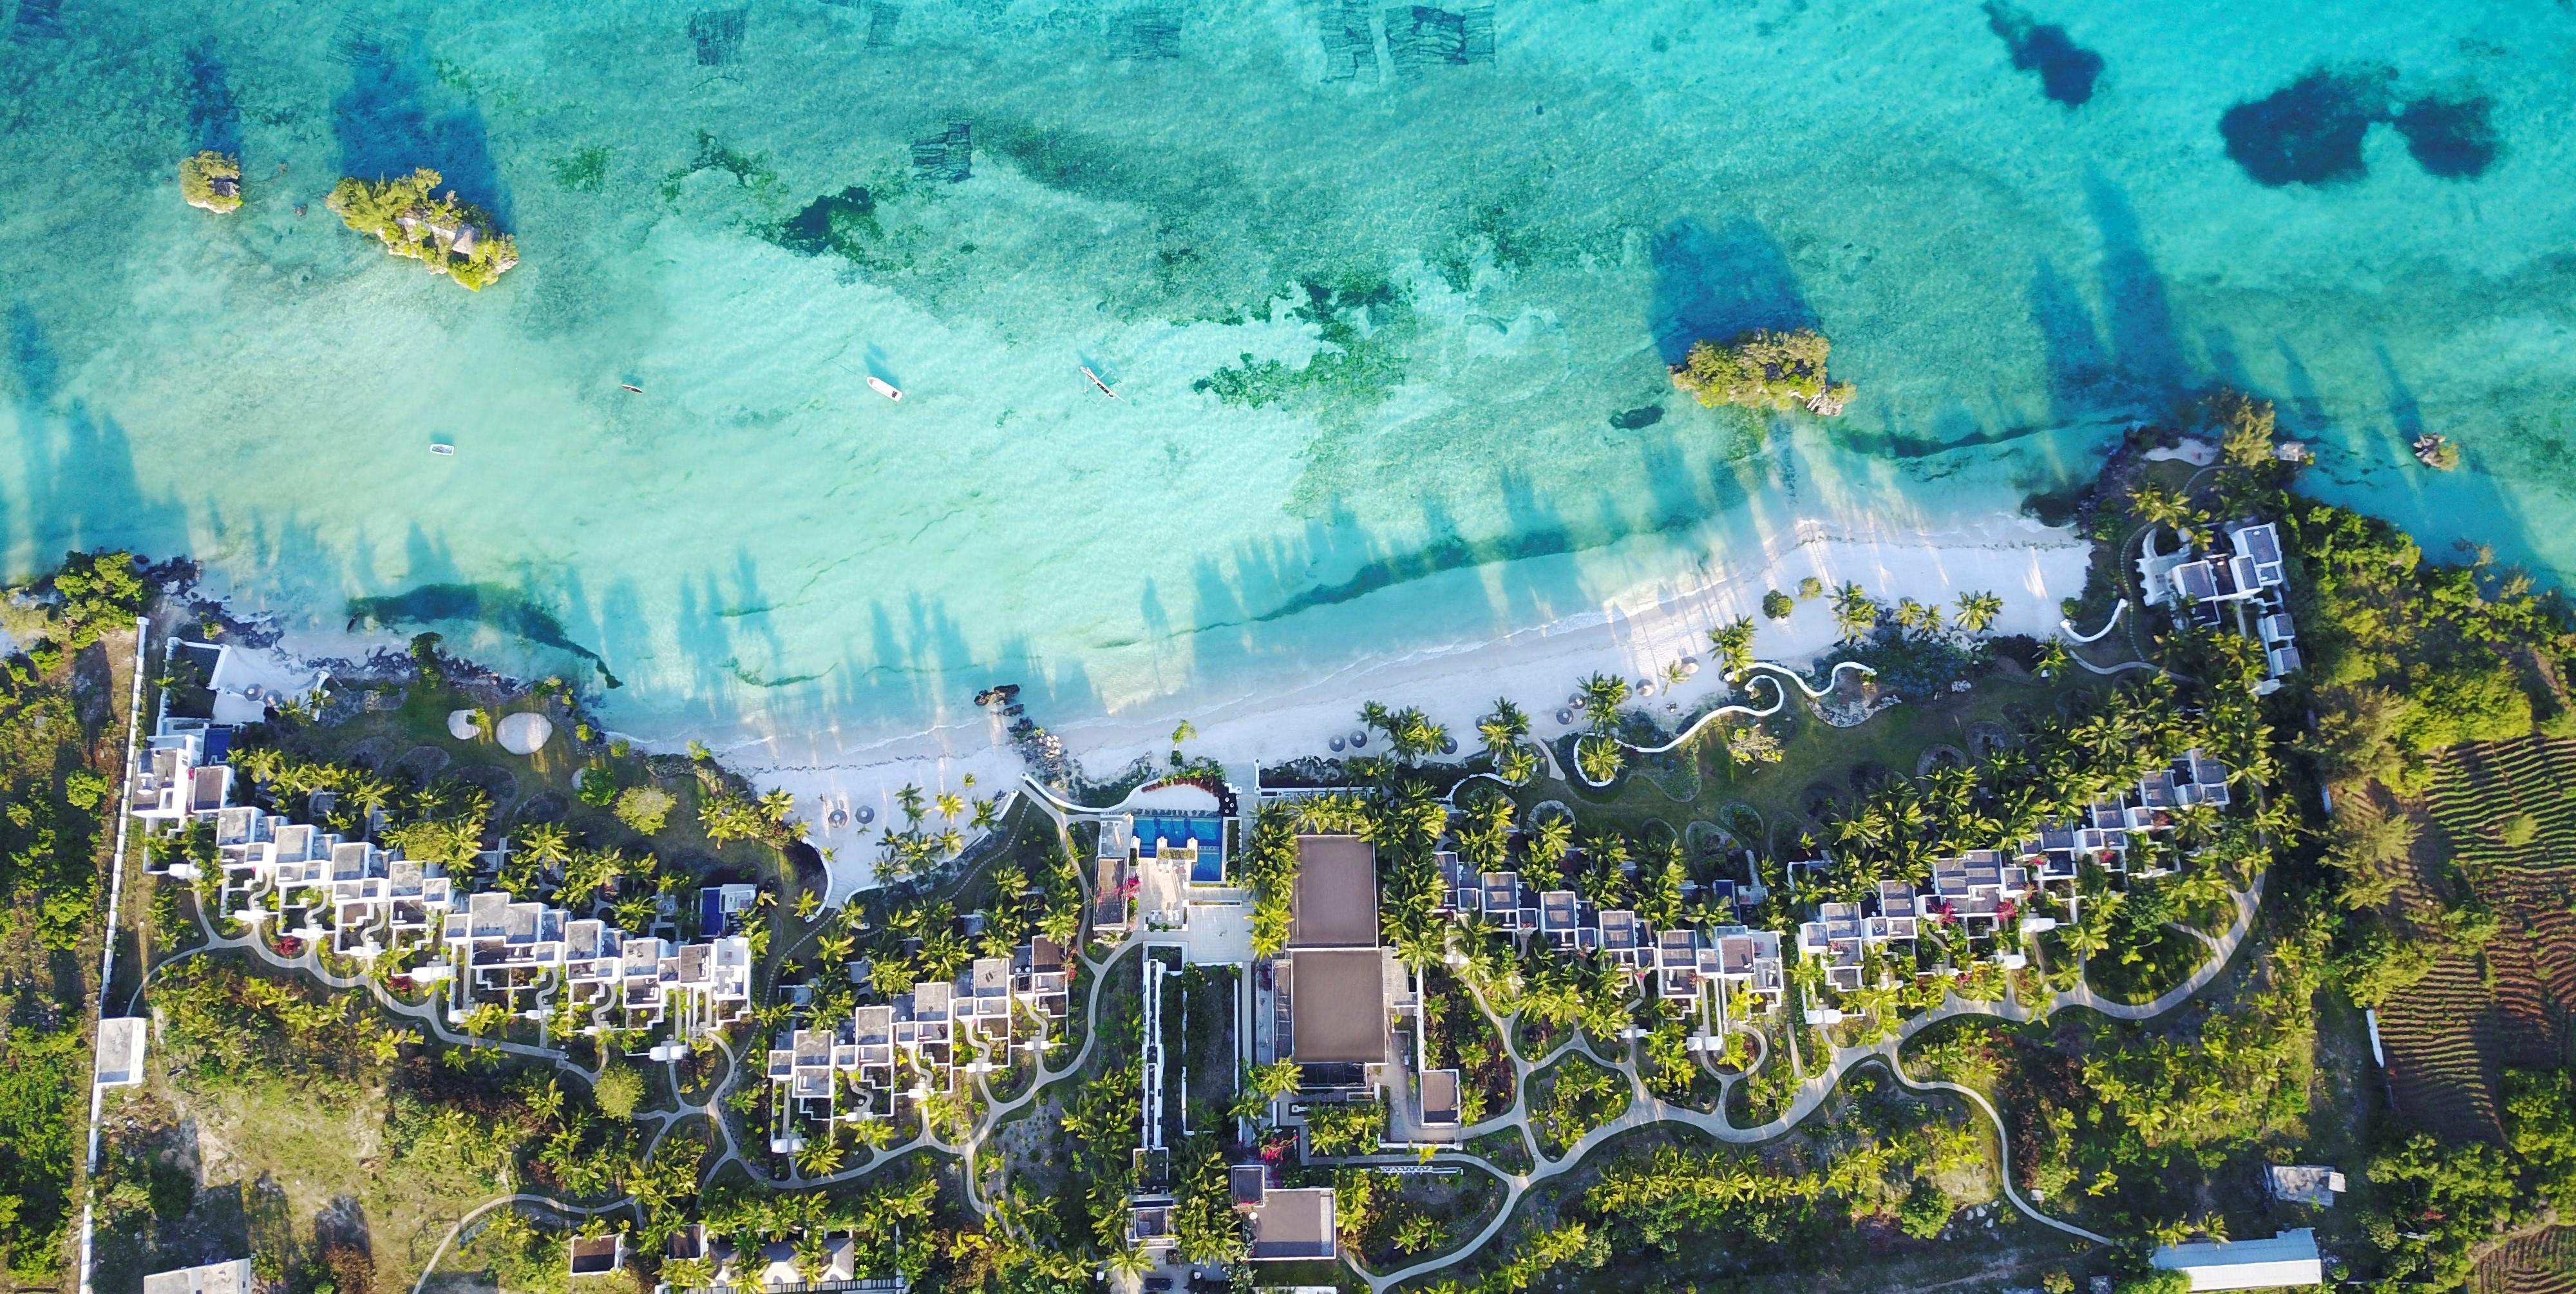 Constance-Aiyana-Pemba-island-aerial